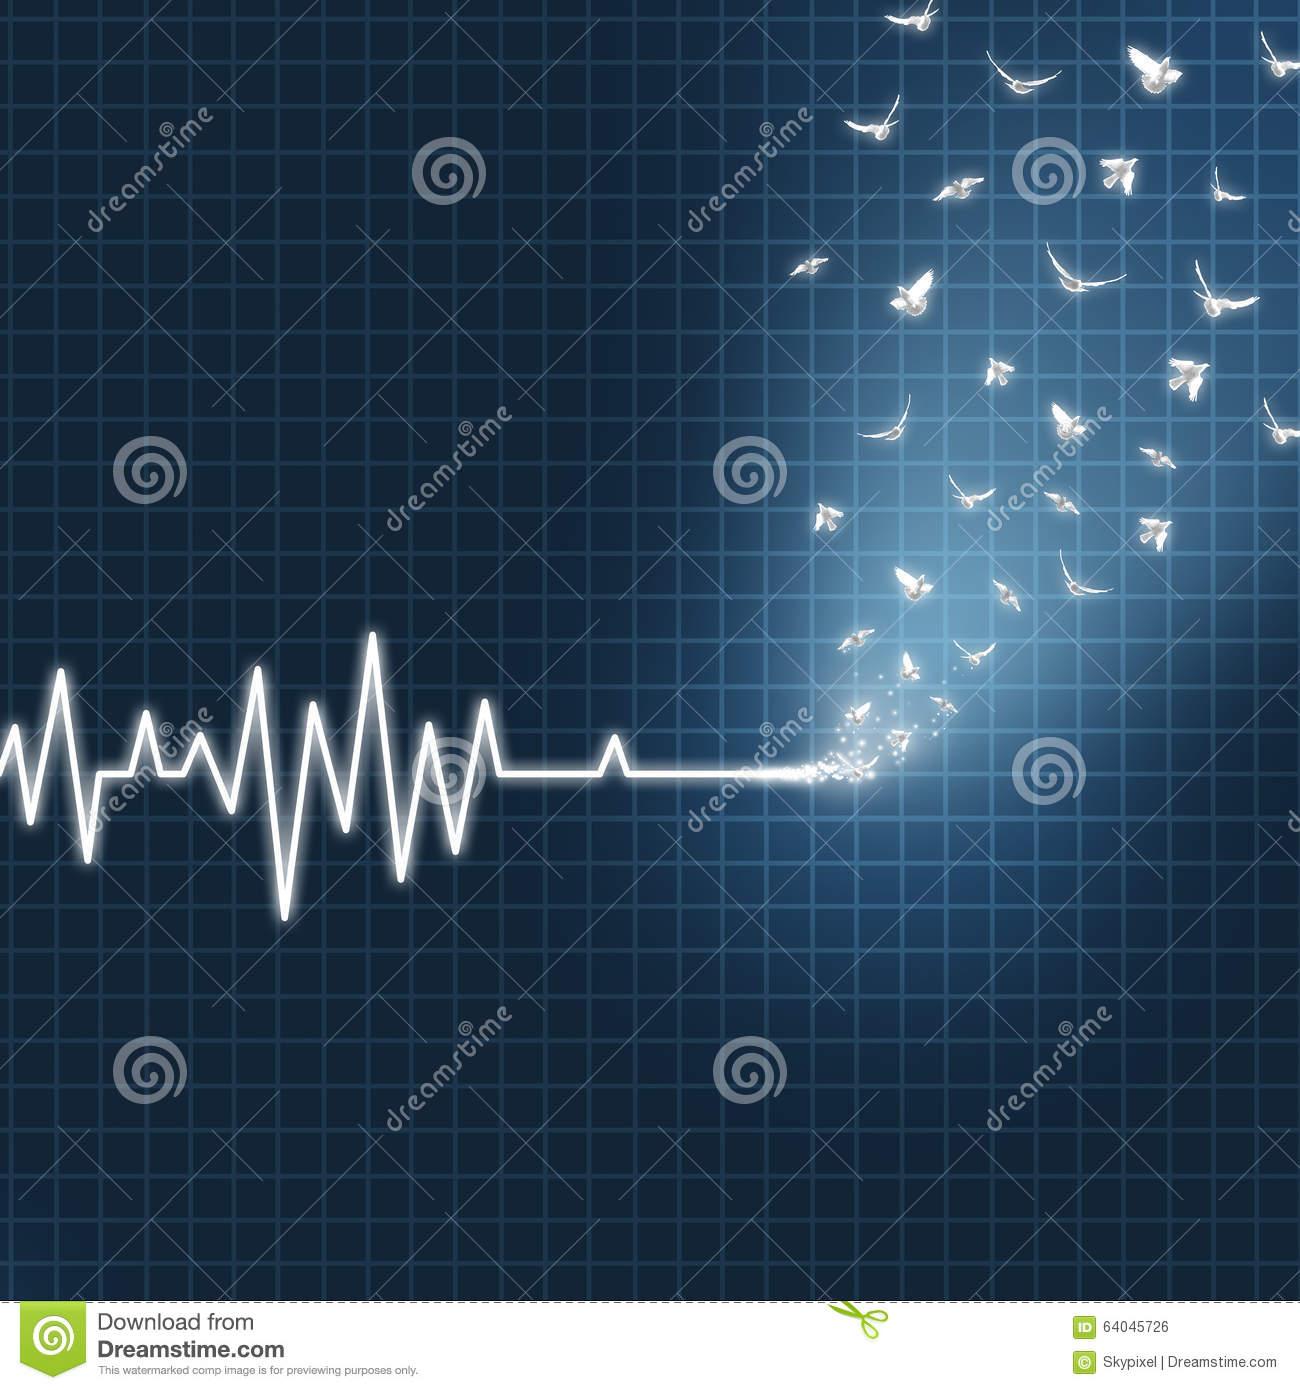 afterlife-concept-as-ecg-ekg-medical-heart-monitor-lifeline-showing-flatline-transforming-white-doves-flying-upward-64045726[1]